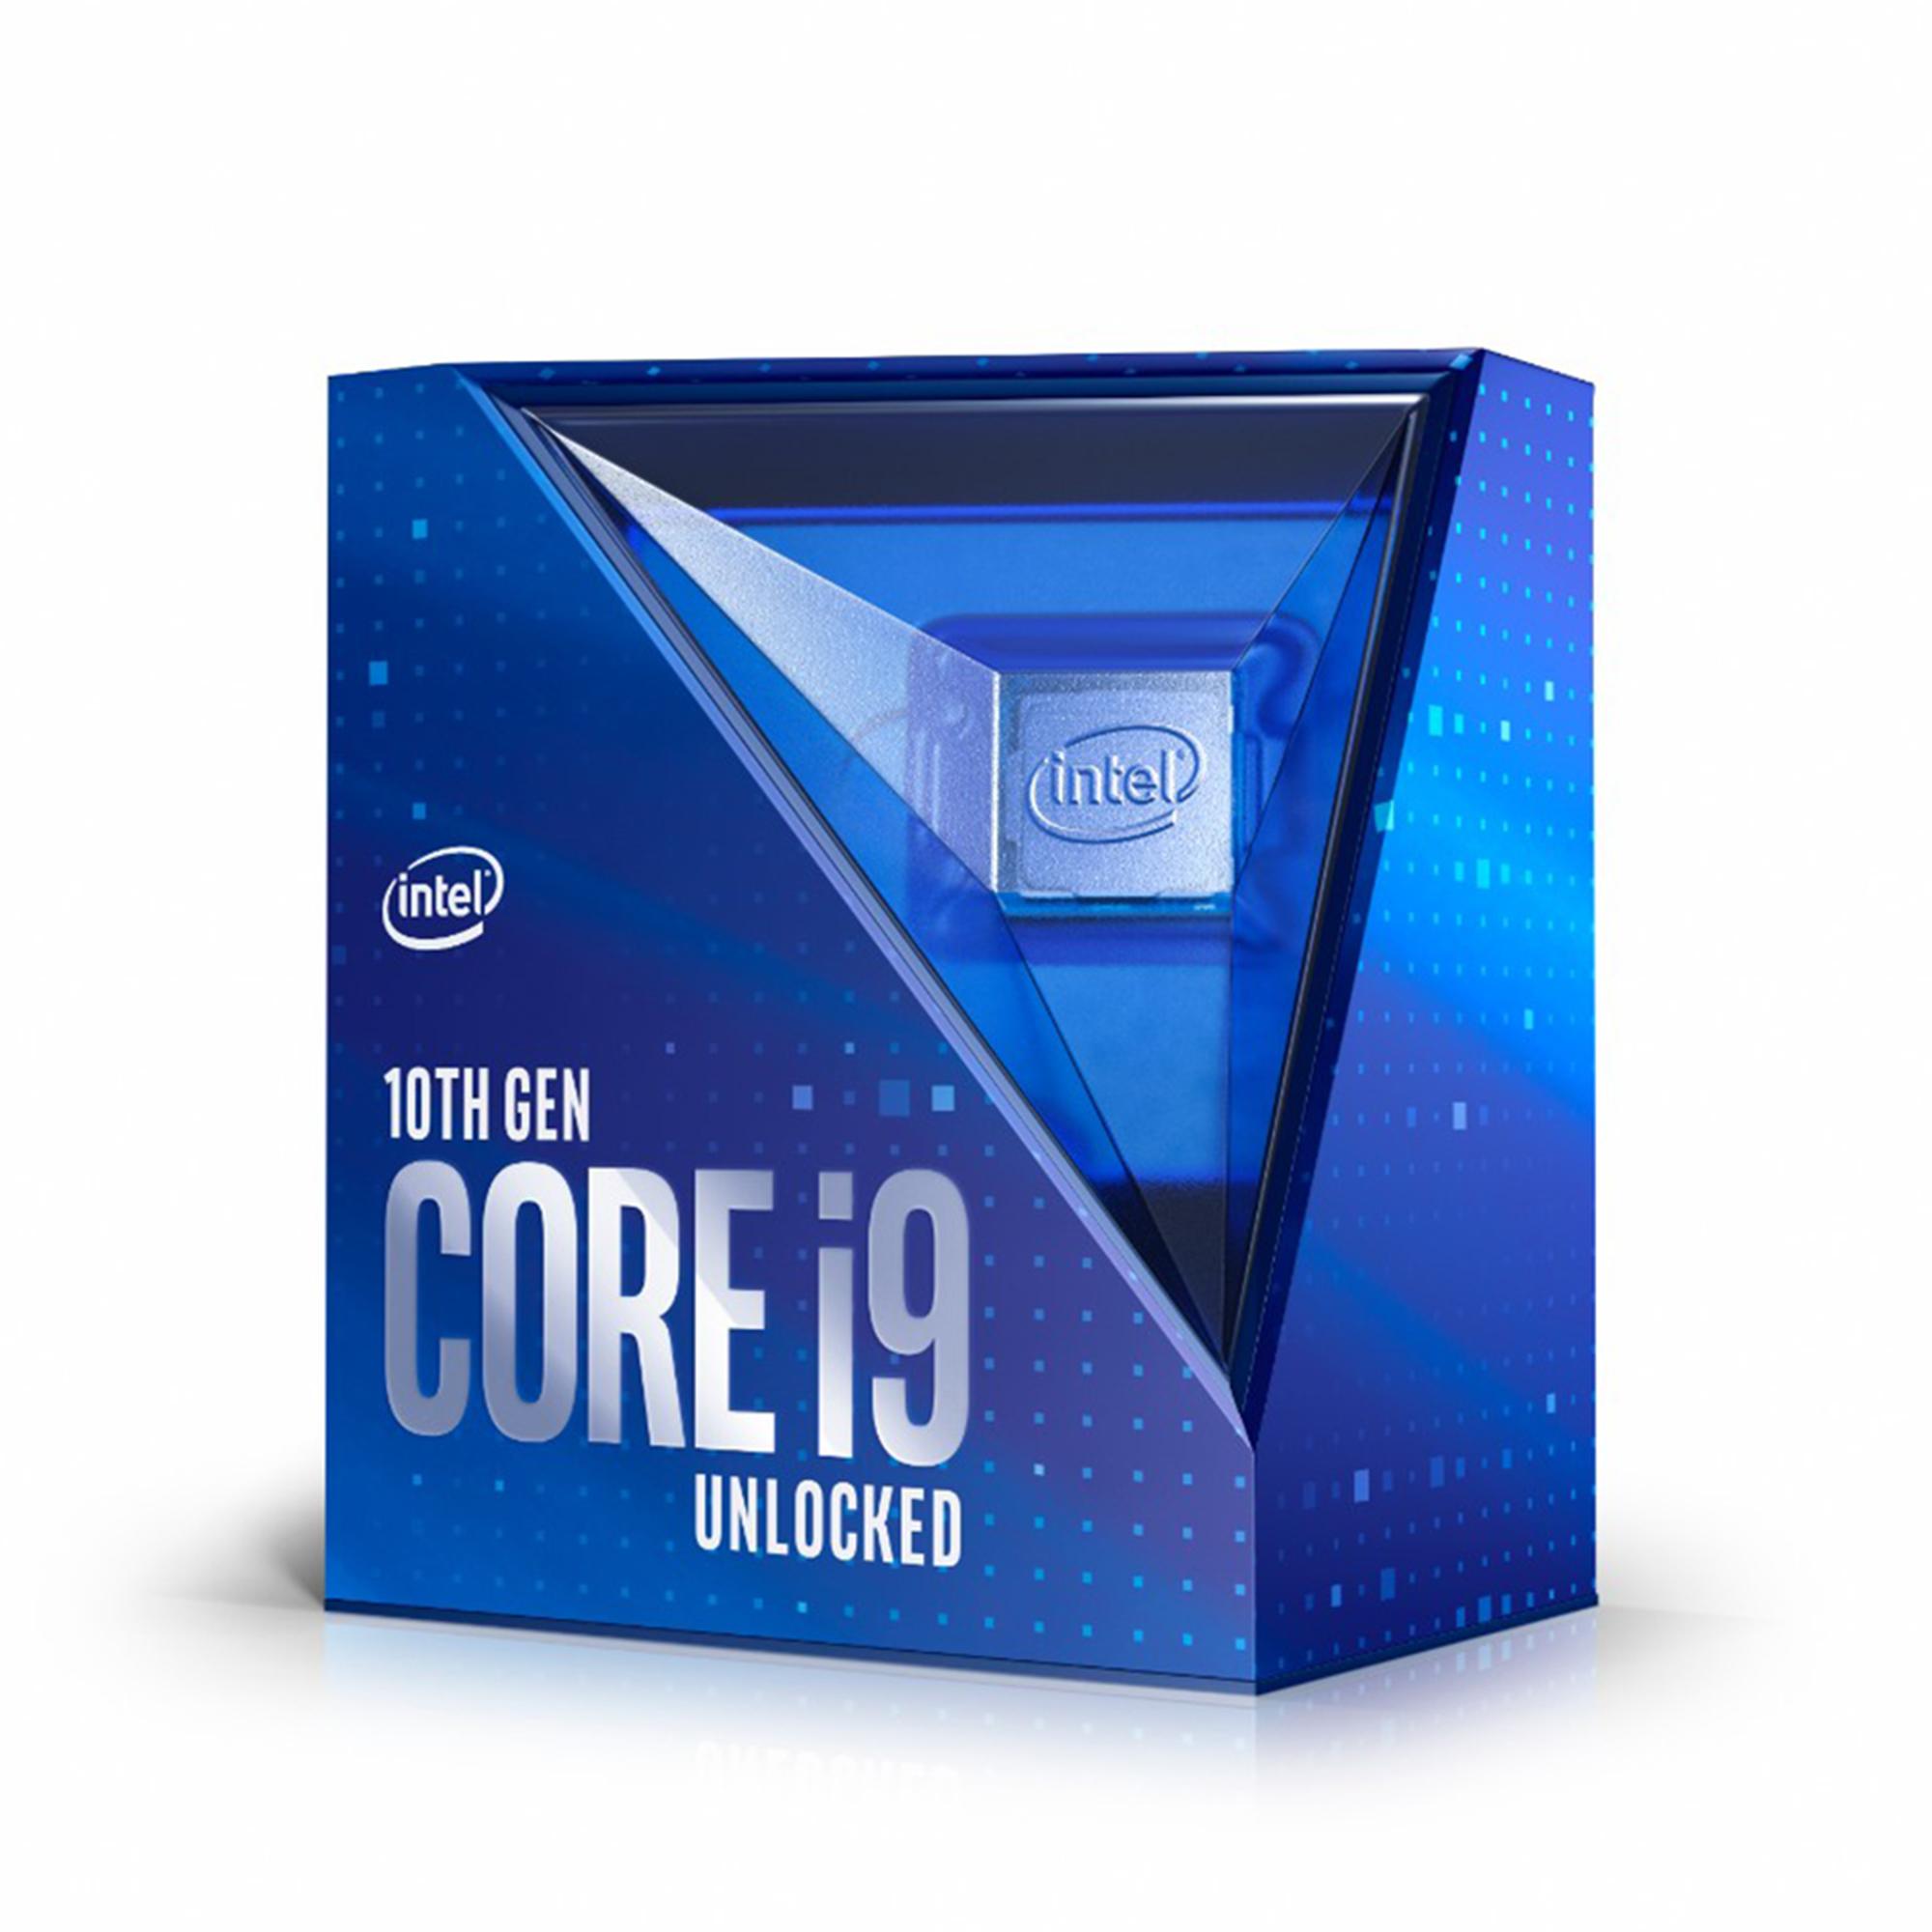 Core i9-10900K - 3.7/5.3 GHz